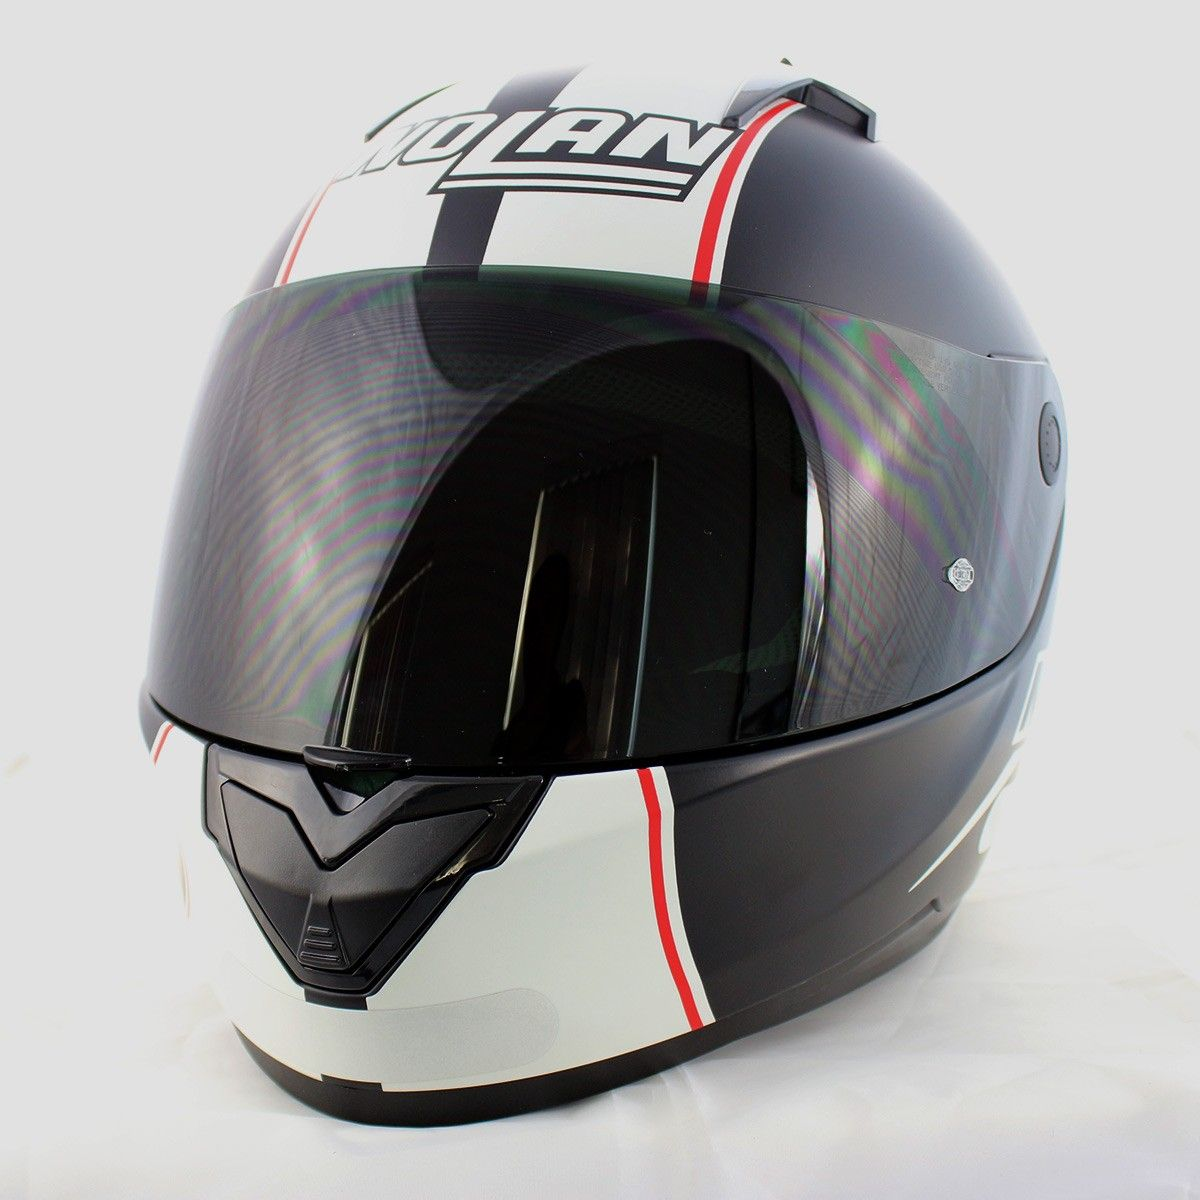 0 Capacete Nolan N64 MotoGP Flat Black c/ Branco  (GANHE BALACLAVA)  - Nova Centro Boutique Roupas para Motociclistas